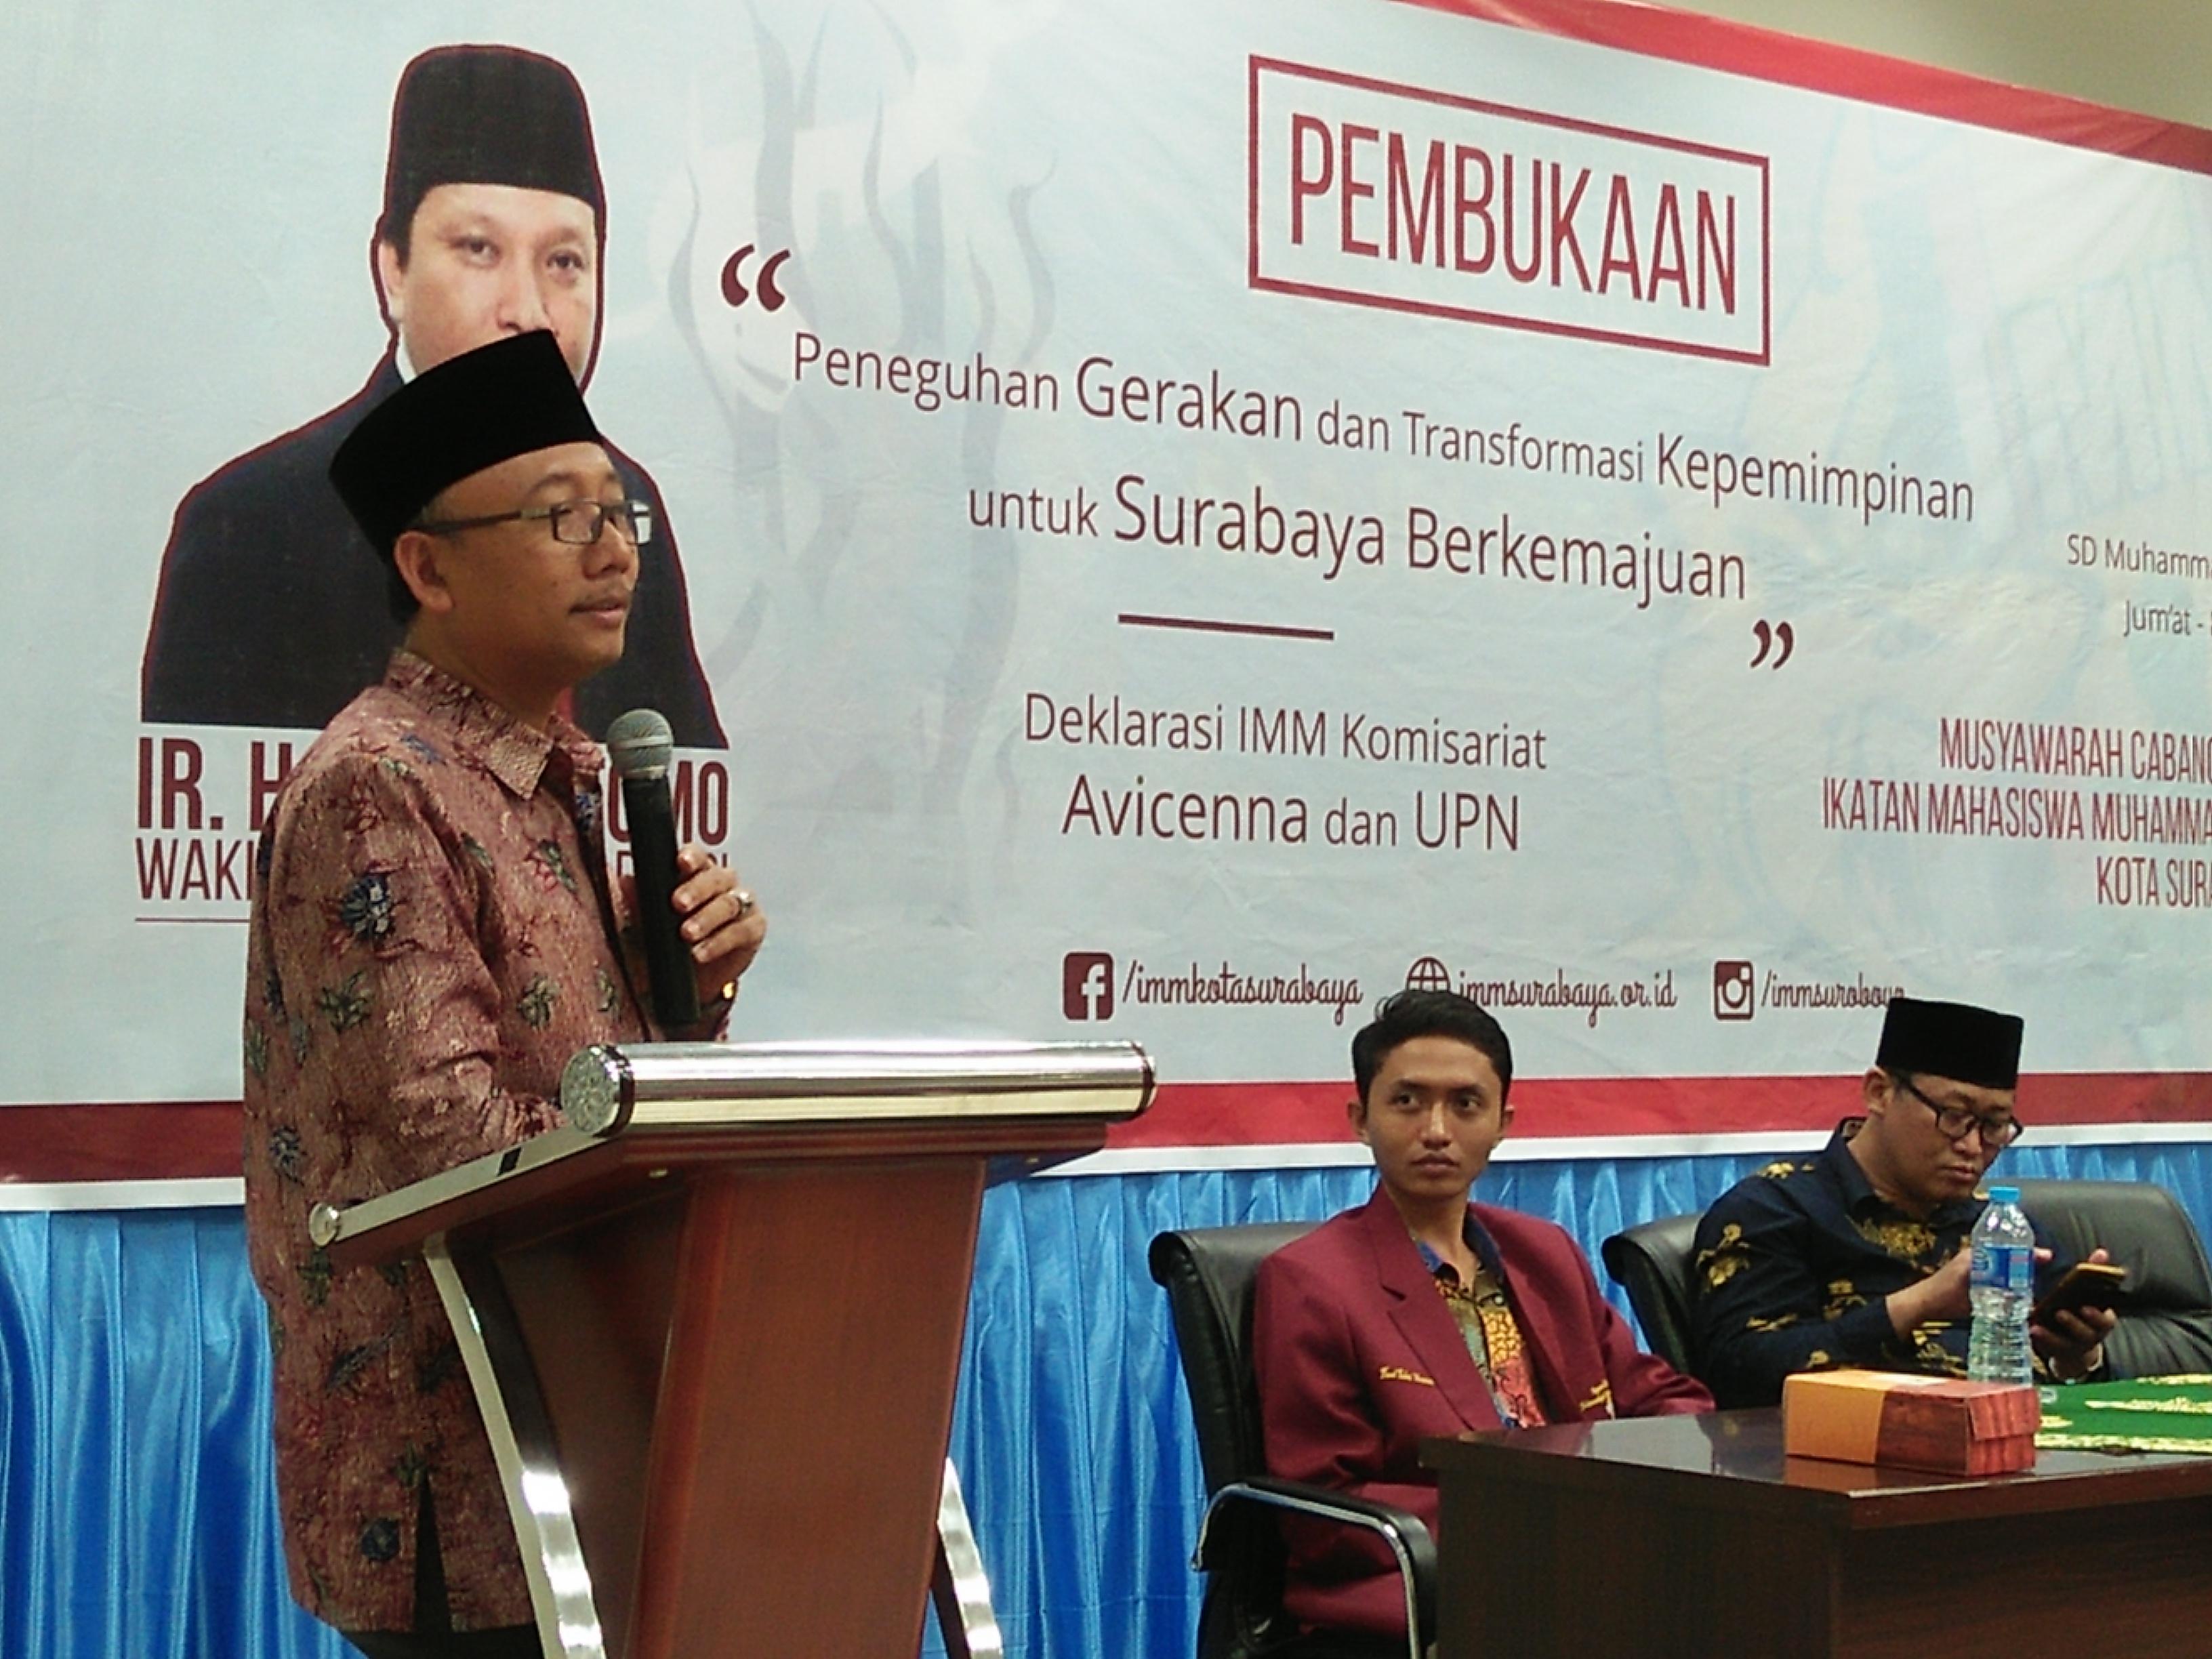 Suli Daim dalam Pembukaan Musycab IMM Surabaya: Jiwa Pemimpin Berkarakter Itu Ada Dalam Kader IMM